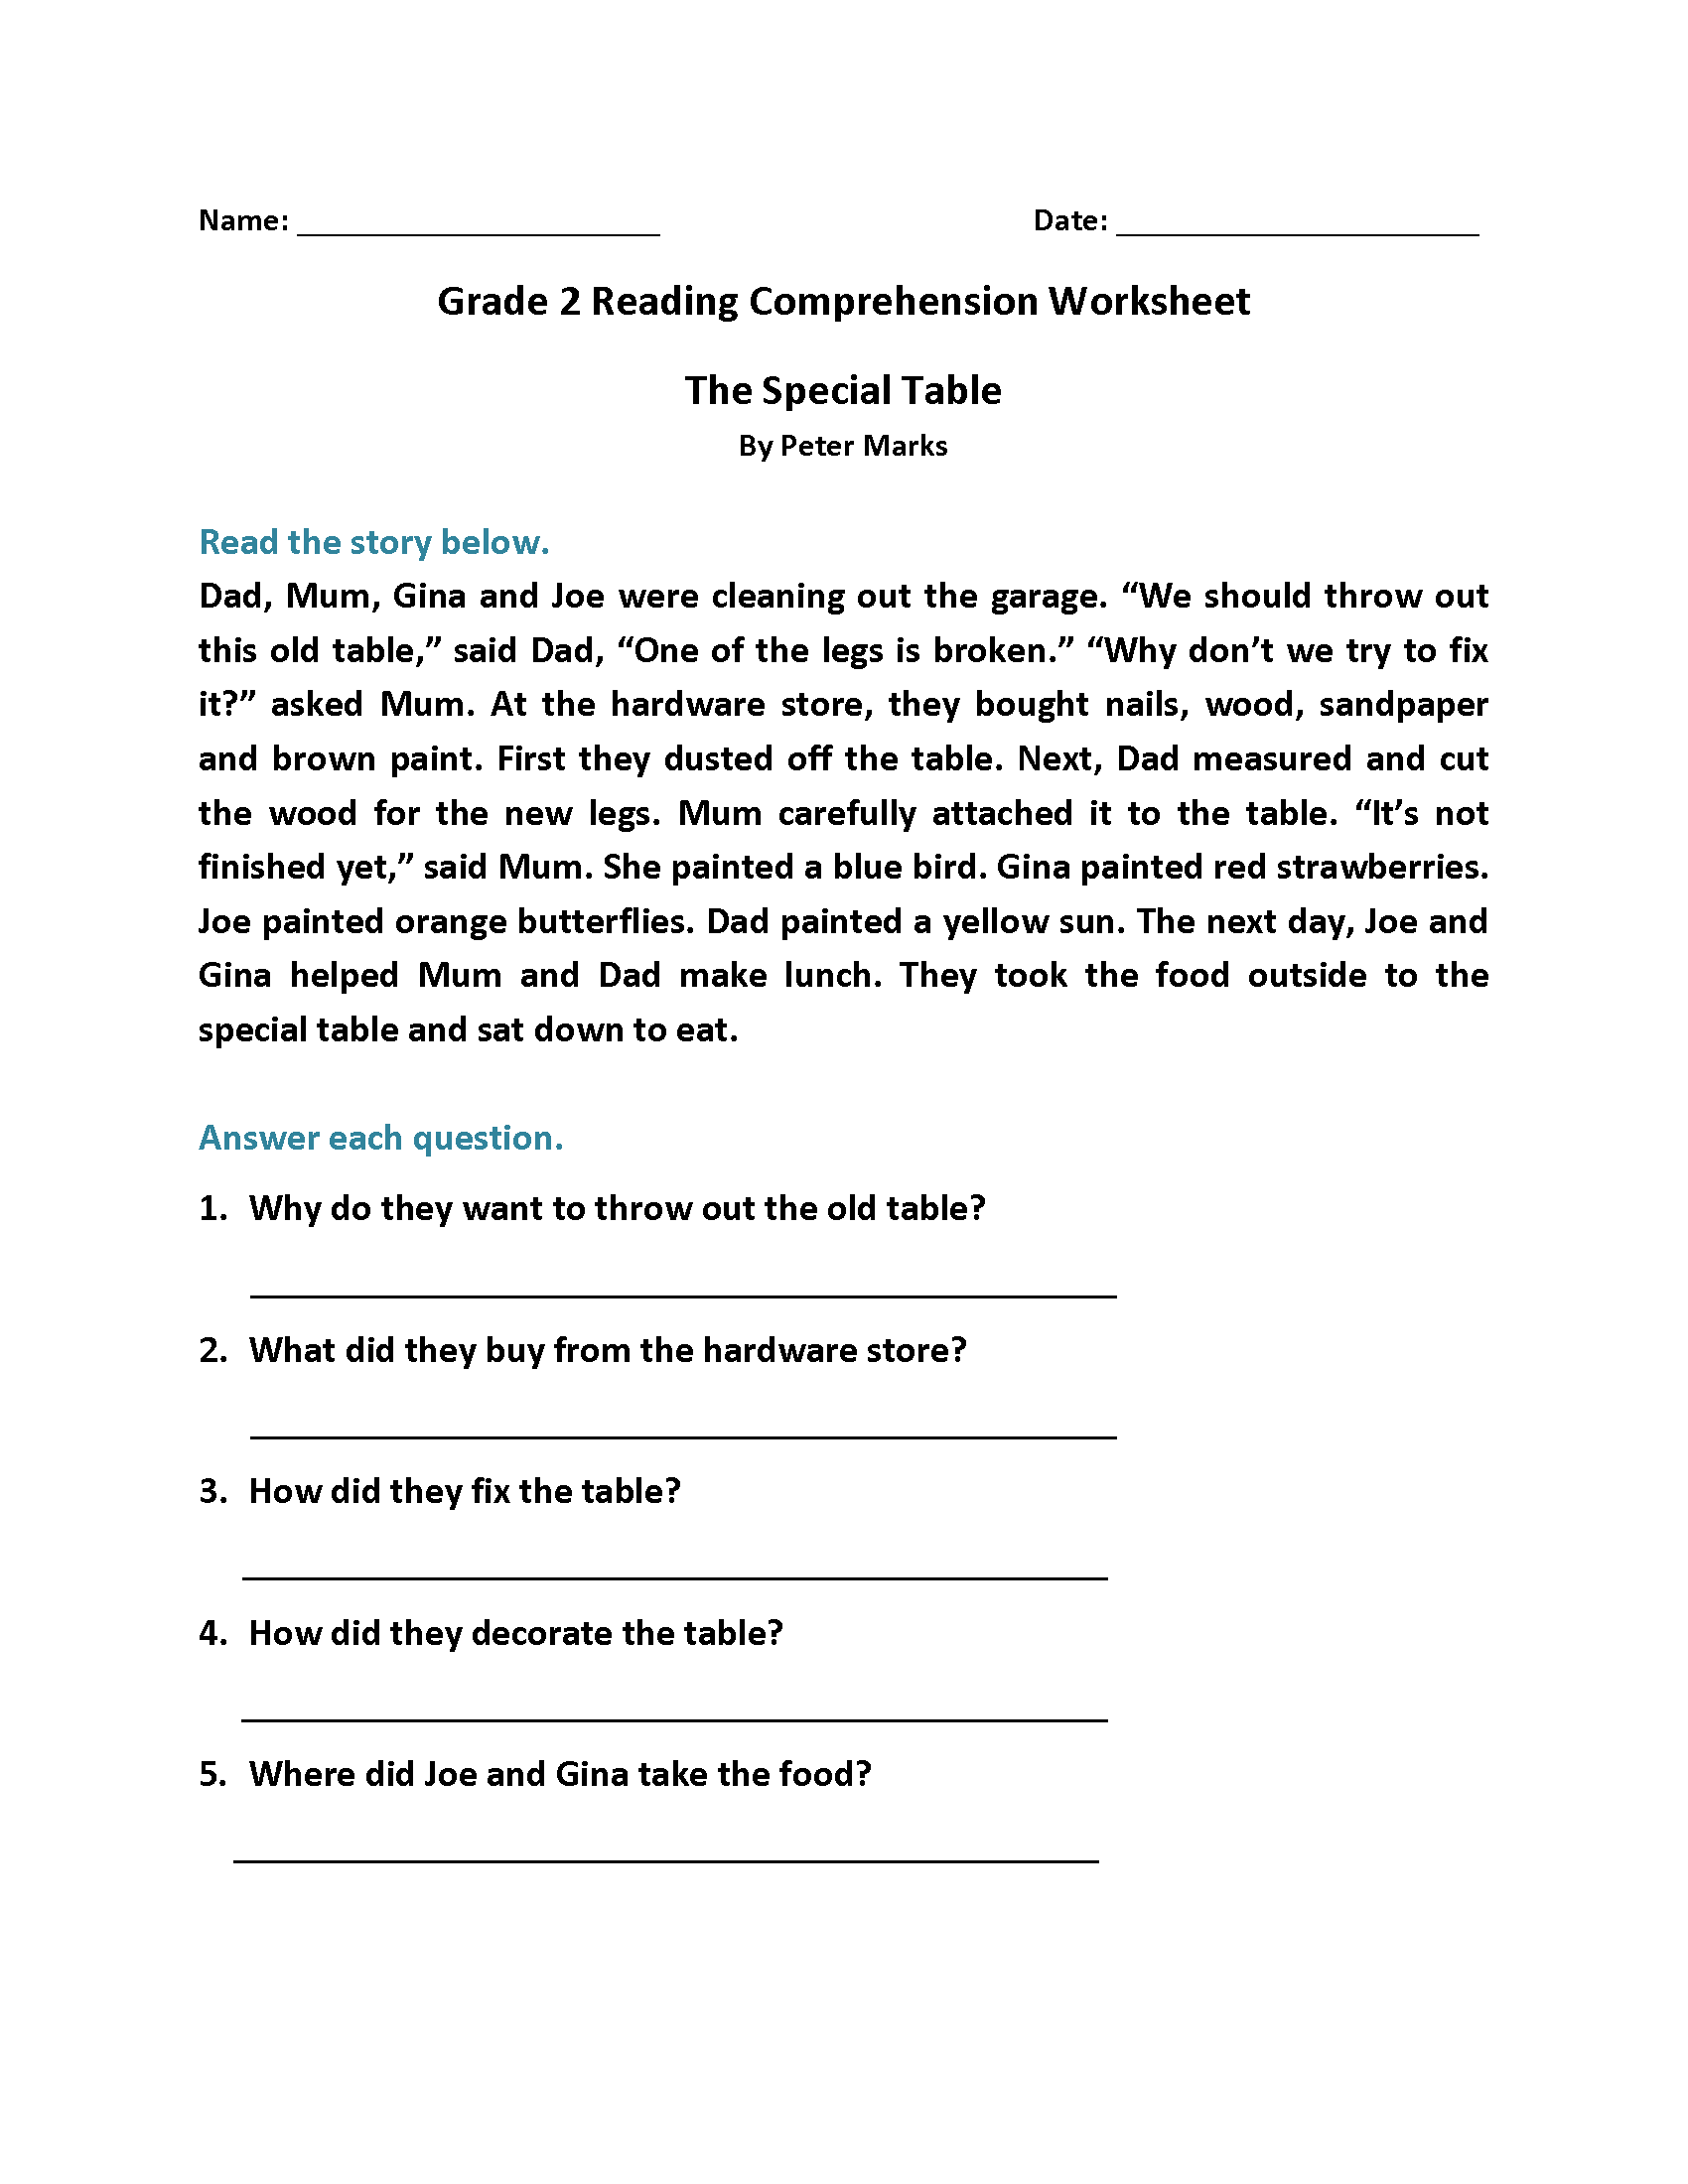 - Free Reading Comprehension Worksheet Grade 2 Printable